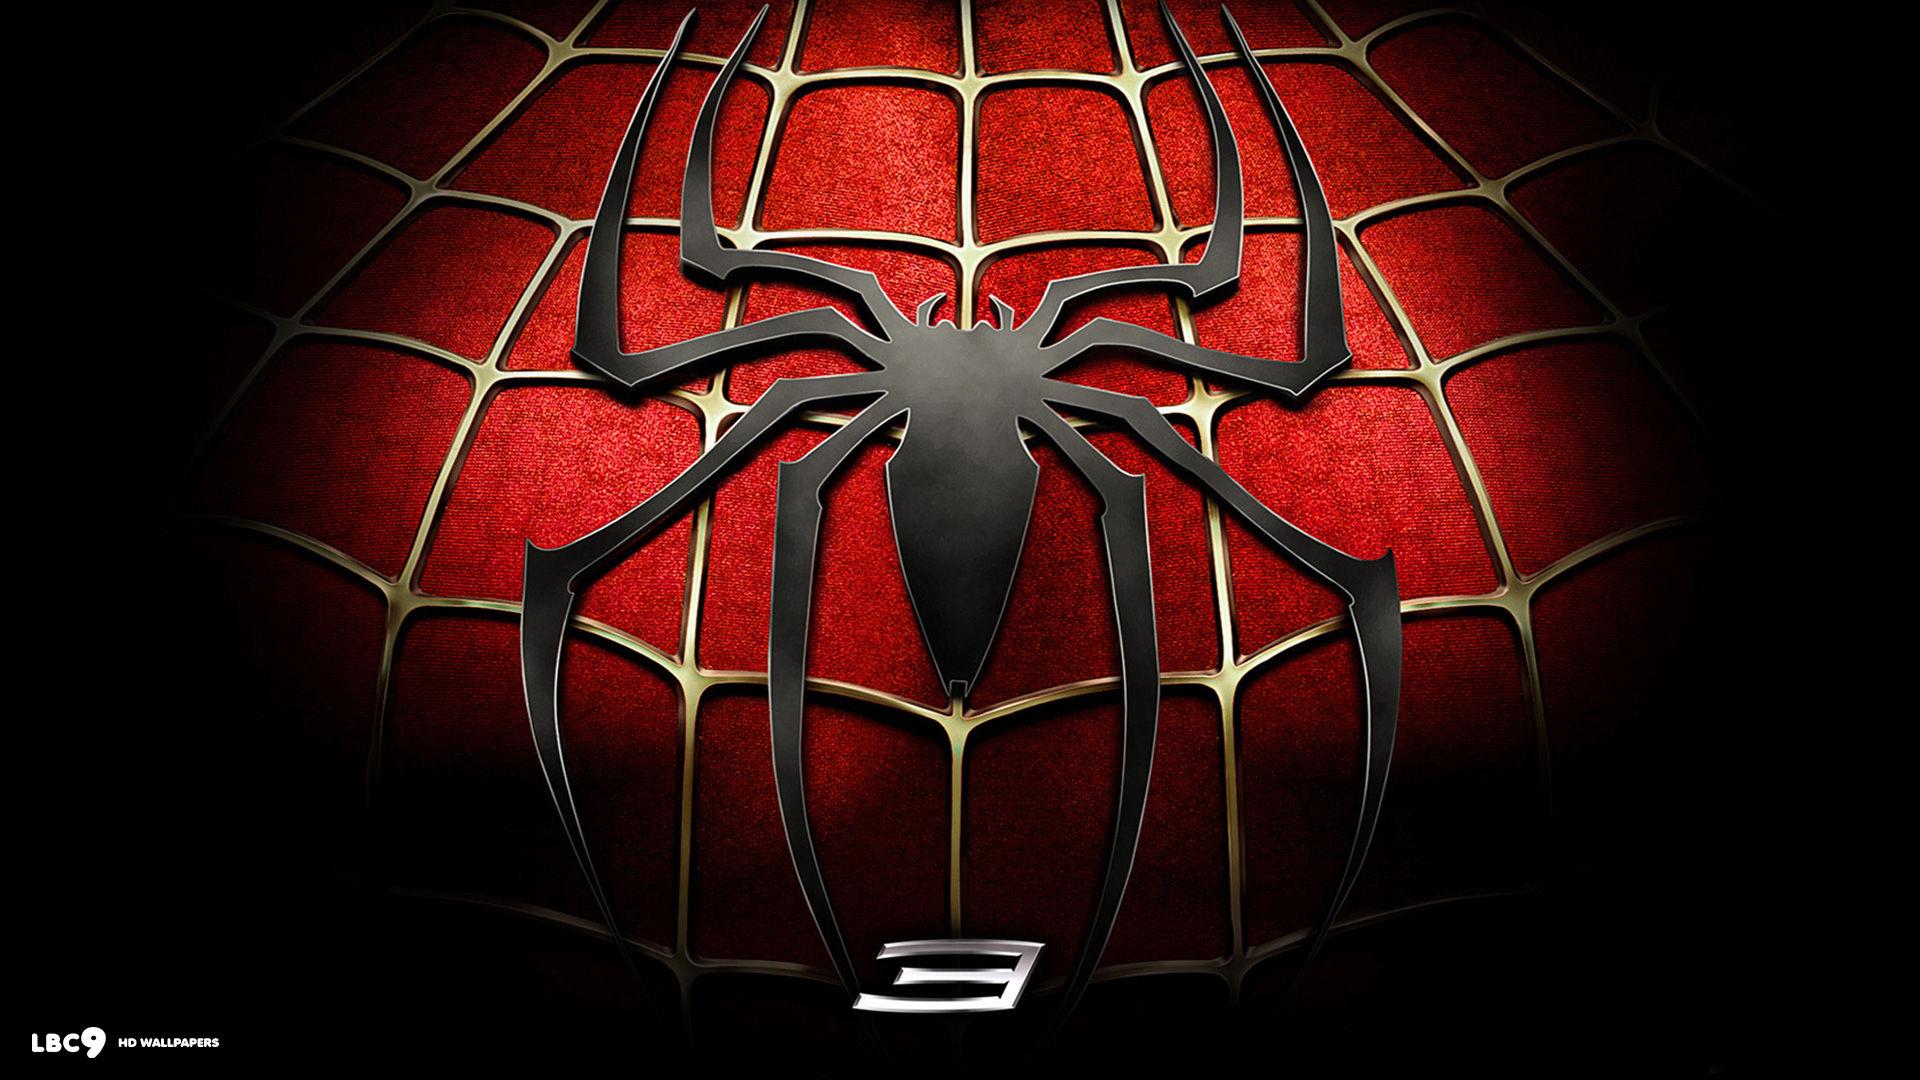 Spiderman Logo Wallpaper Hd 1080p 8 1920x1080